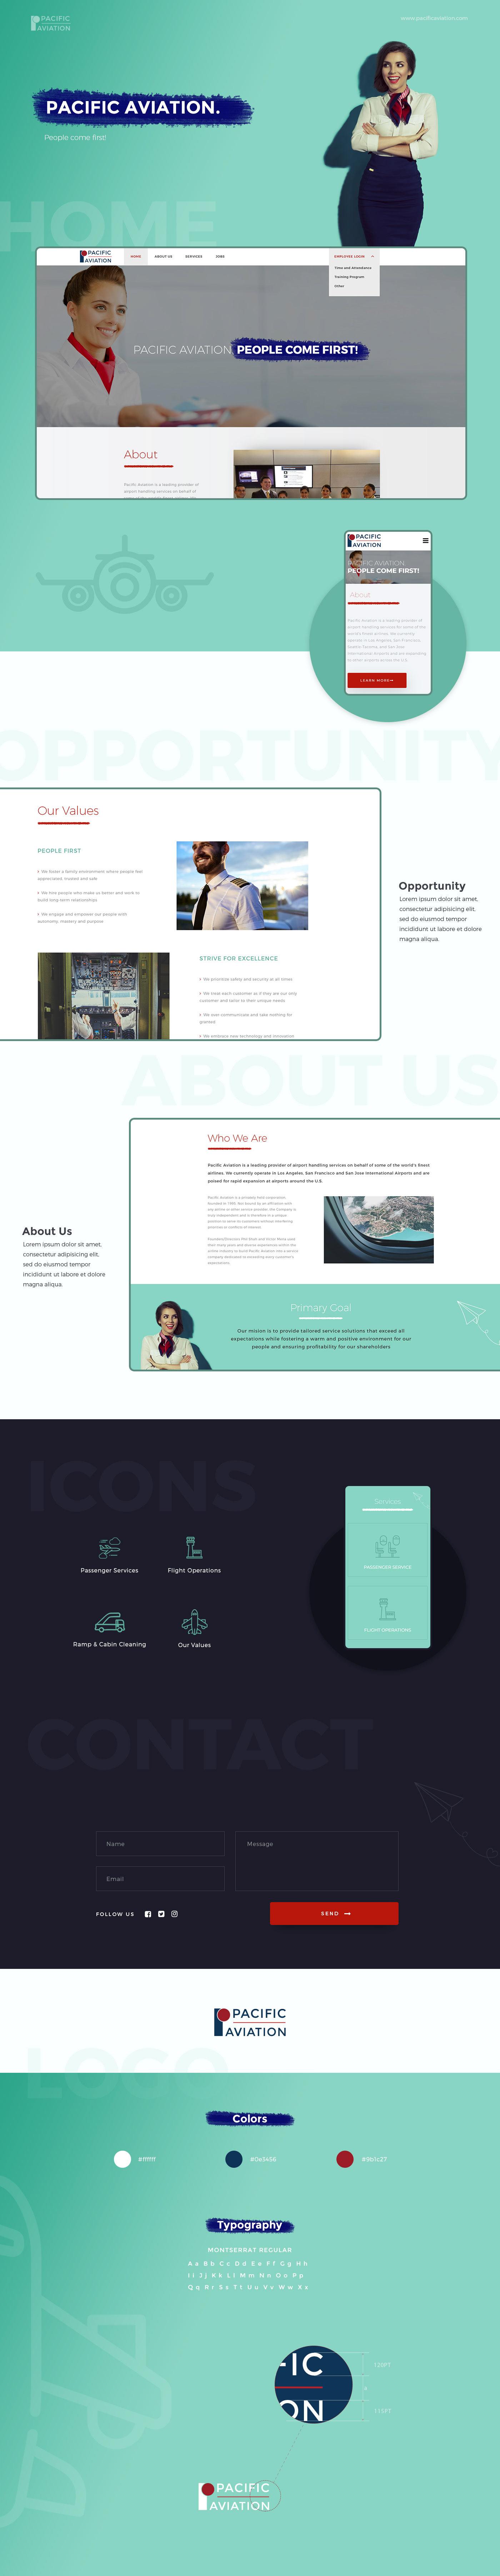 design Webdesign ux UI Webdevelopment